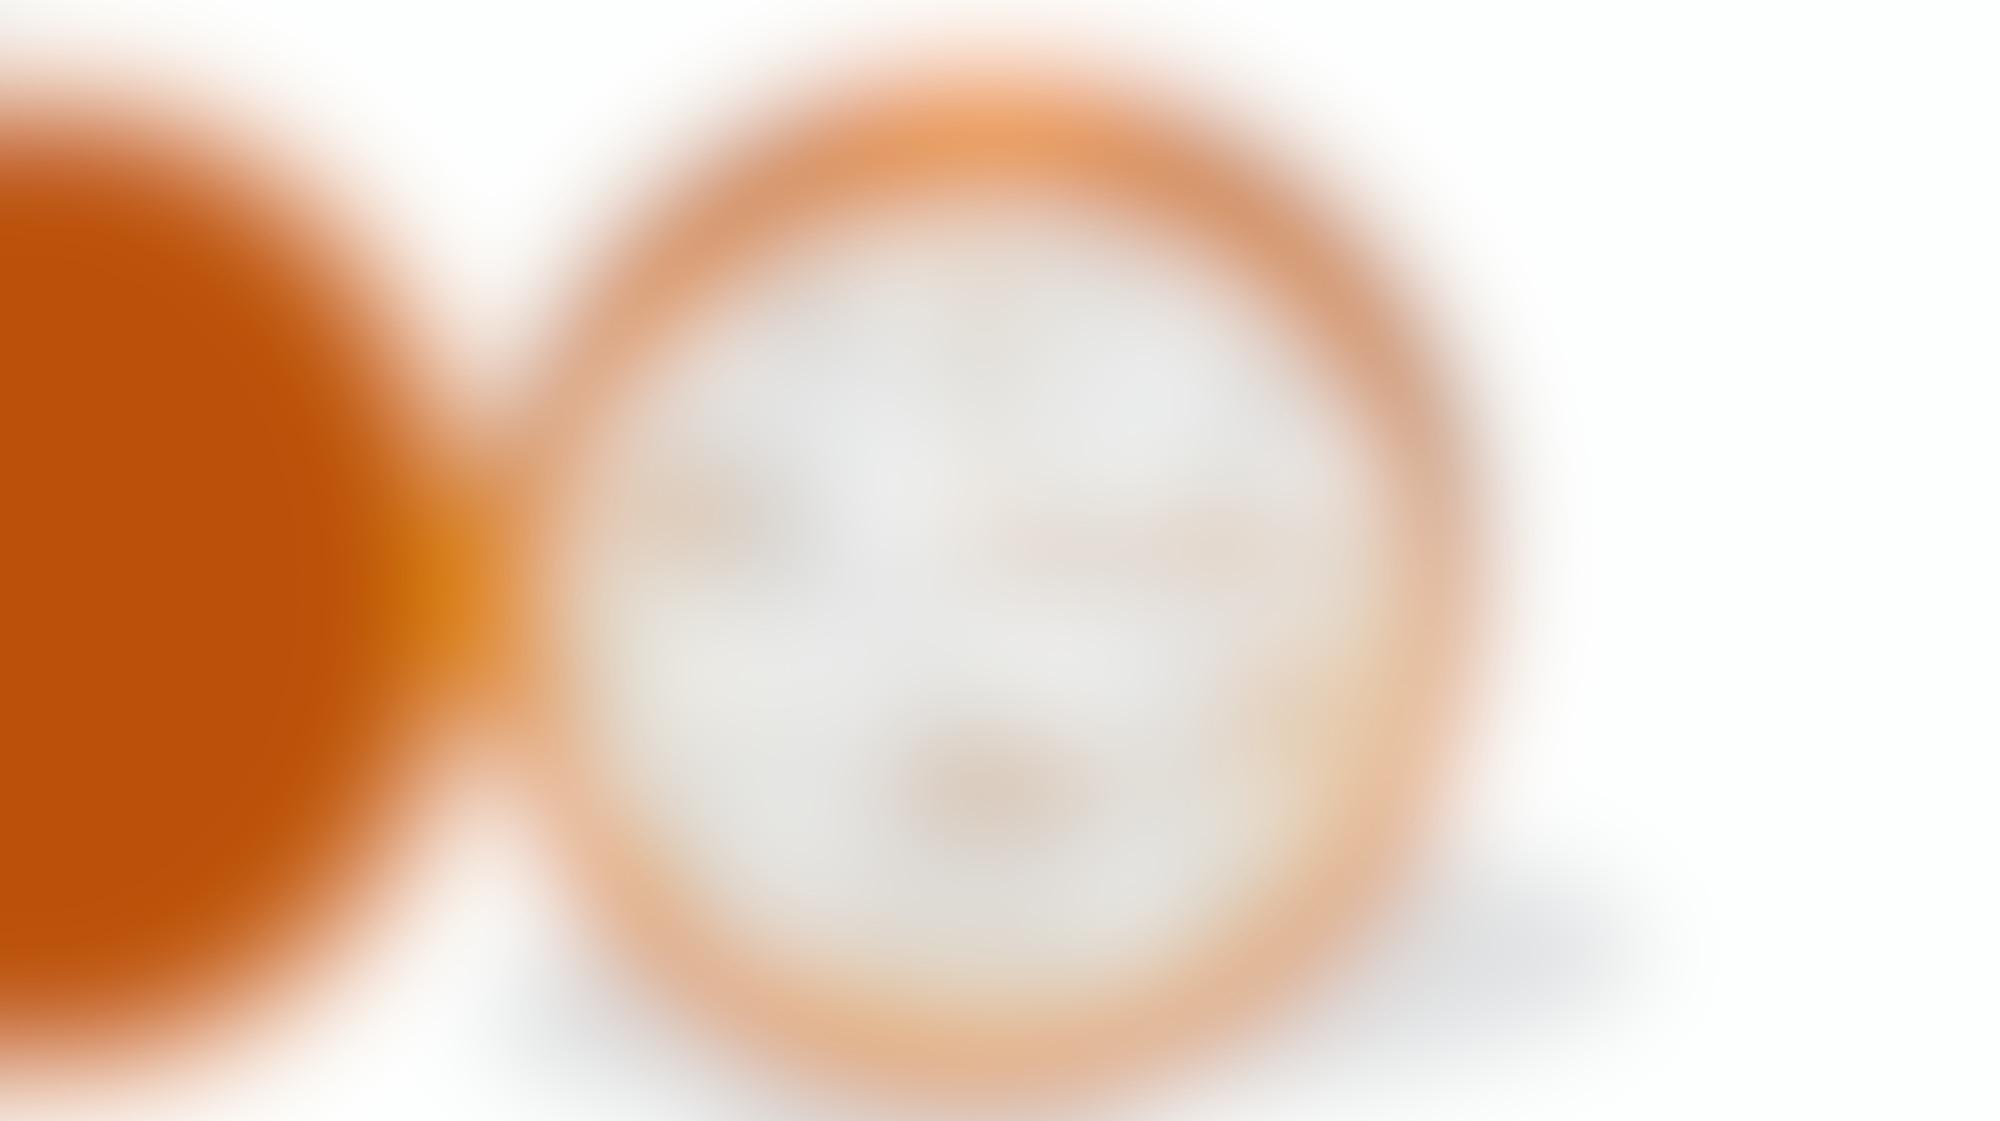 6 Fruit Pastel sketch autocompressfitresizeixlibphp 1 1 0max h2000max w3 D2000q80sba245afab20691679136f8ac5bf20905